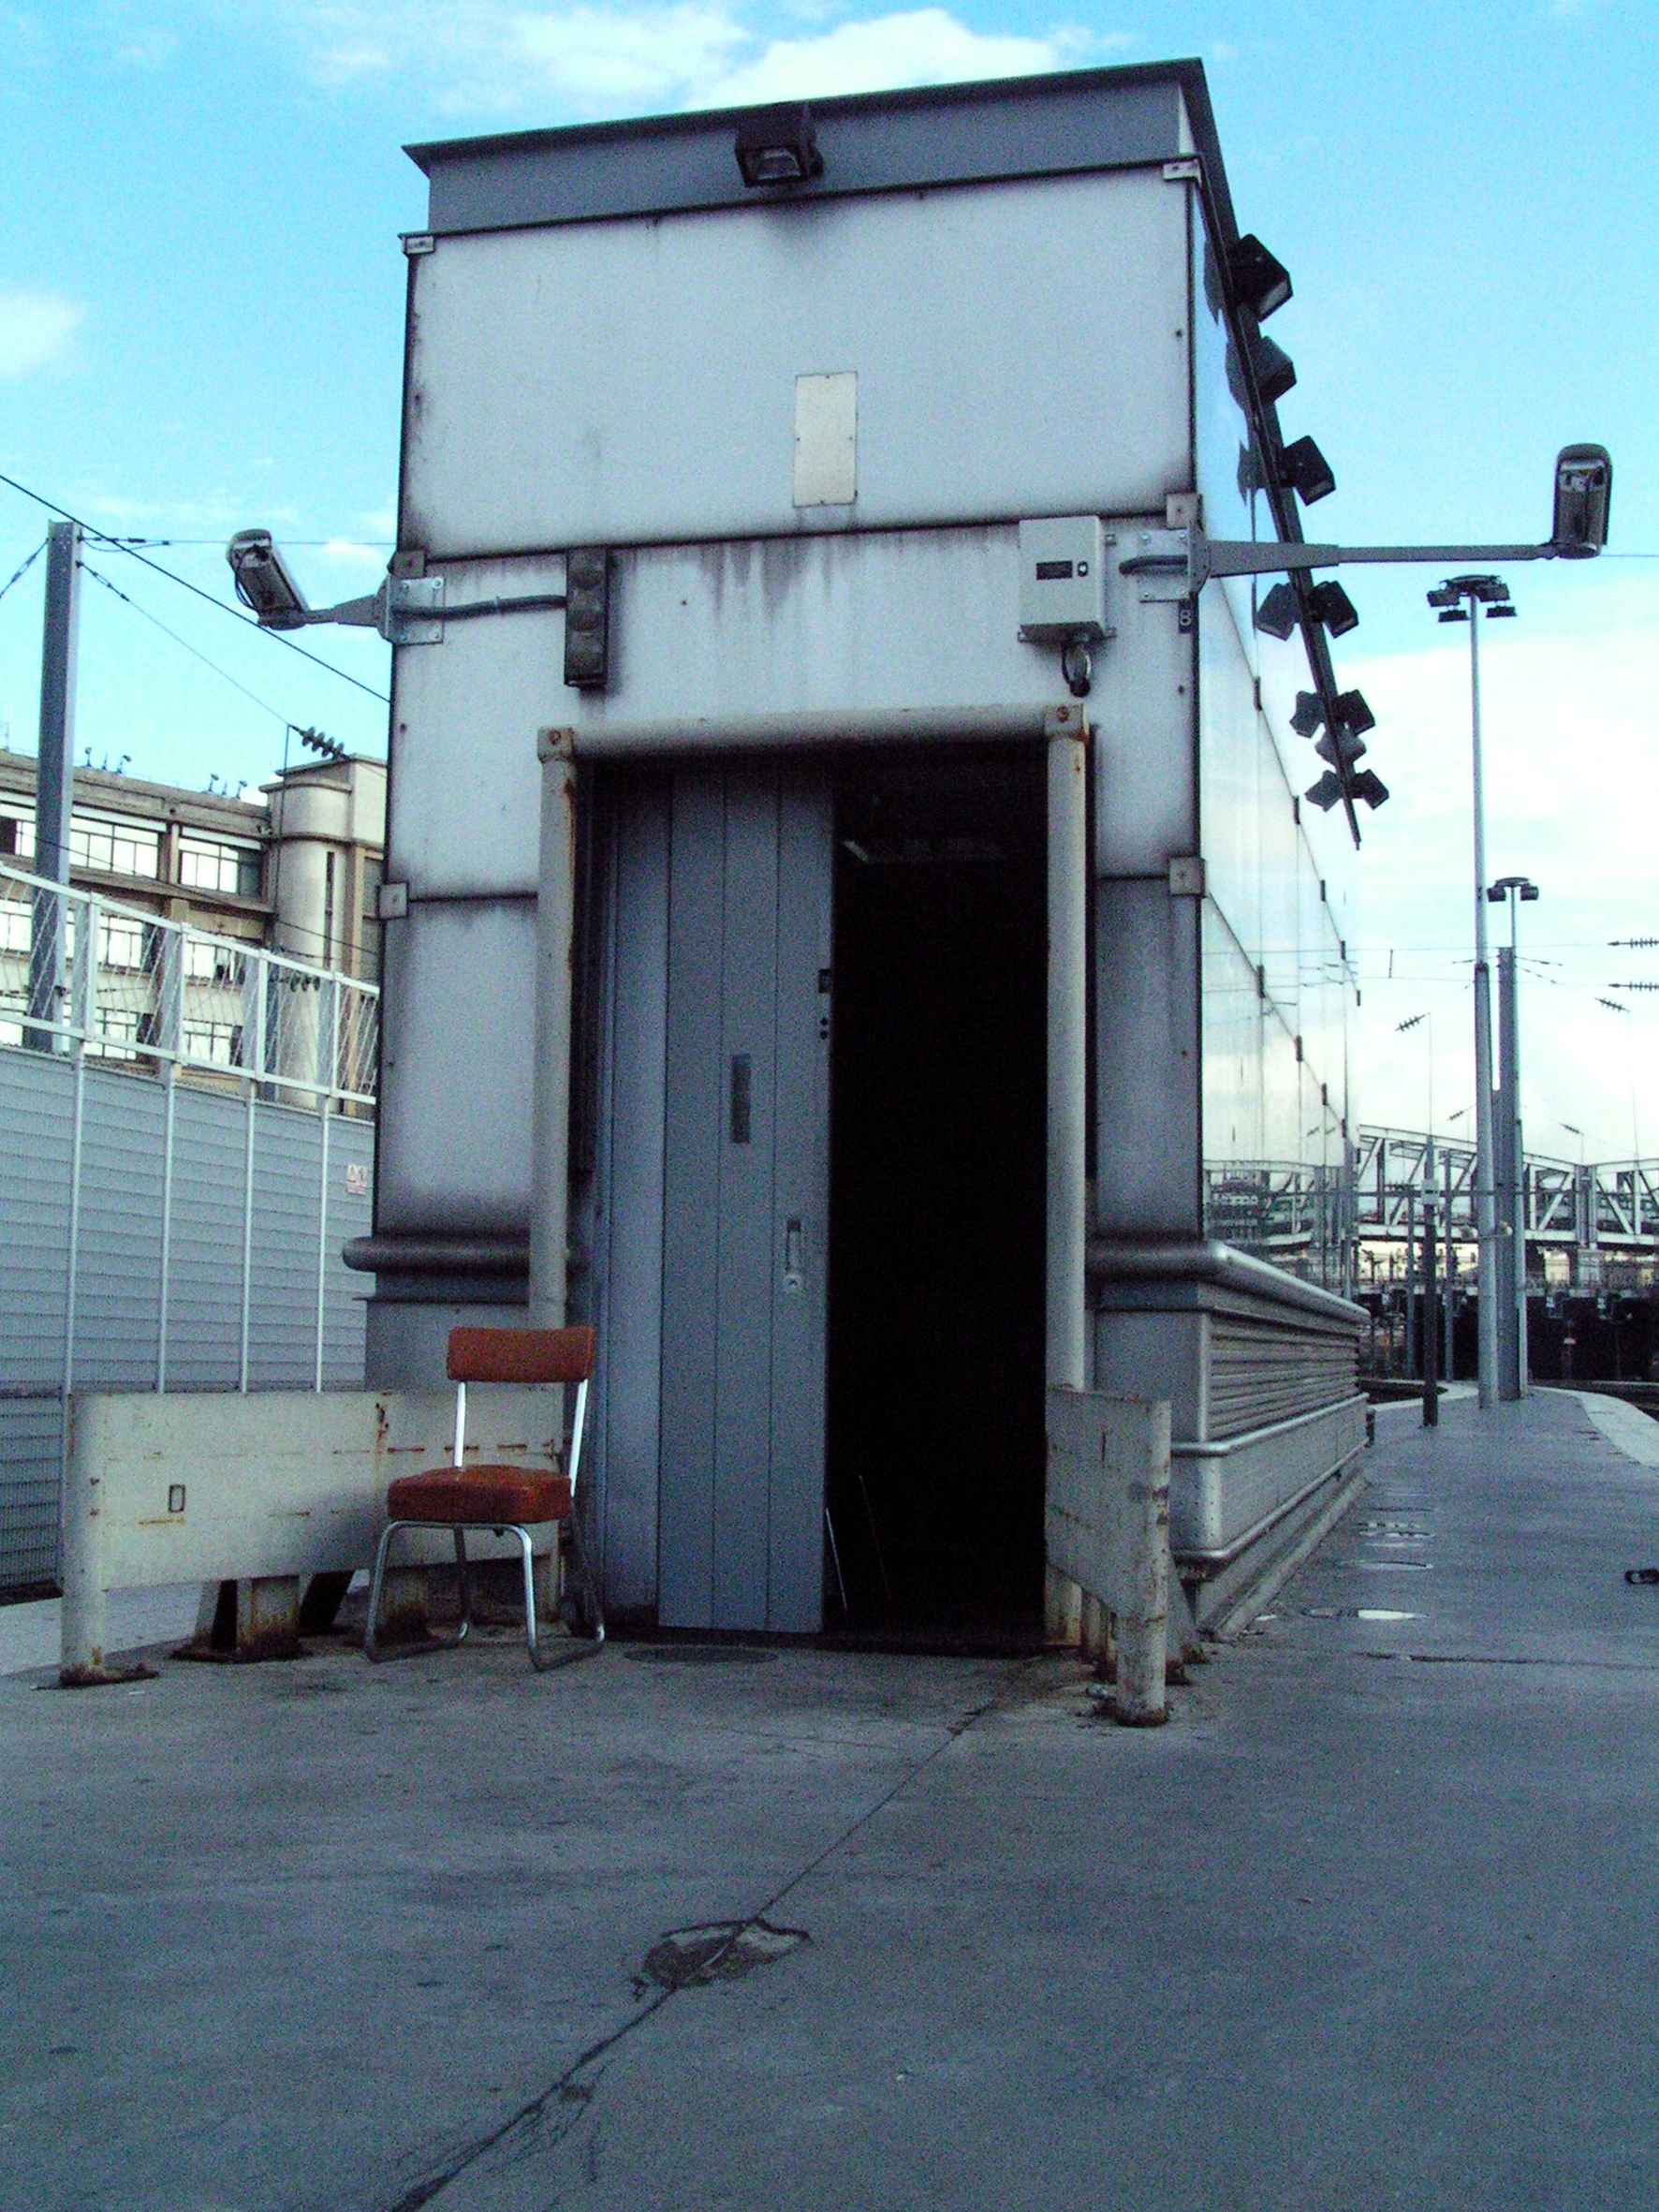 paris-gare-du-nord (5).JPG